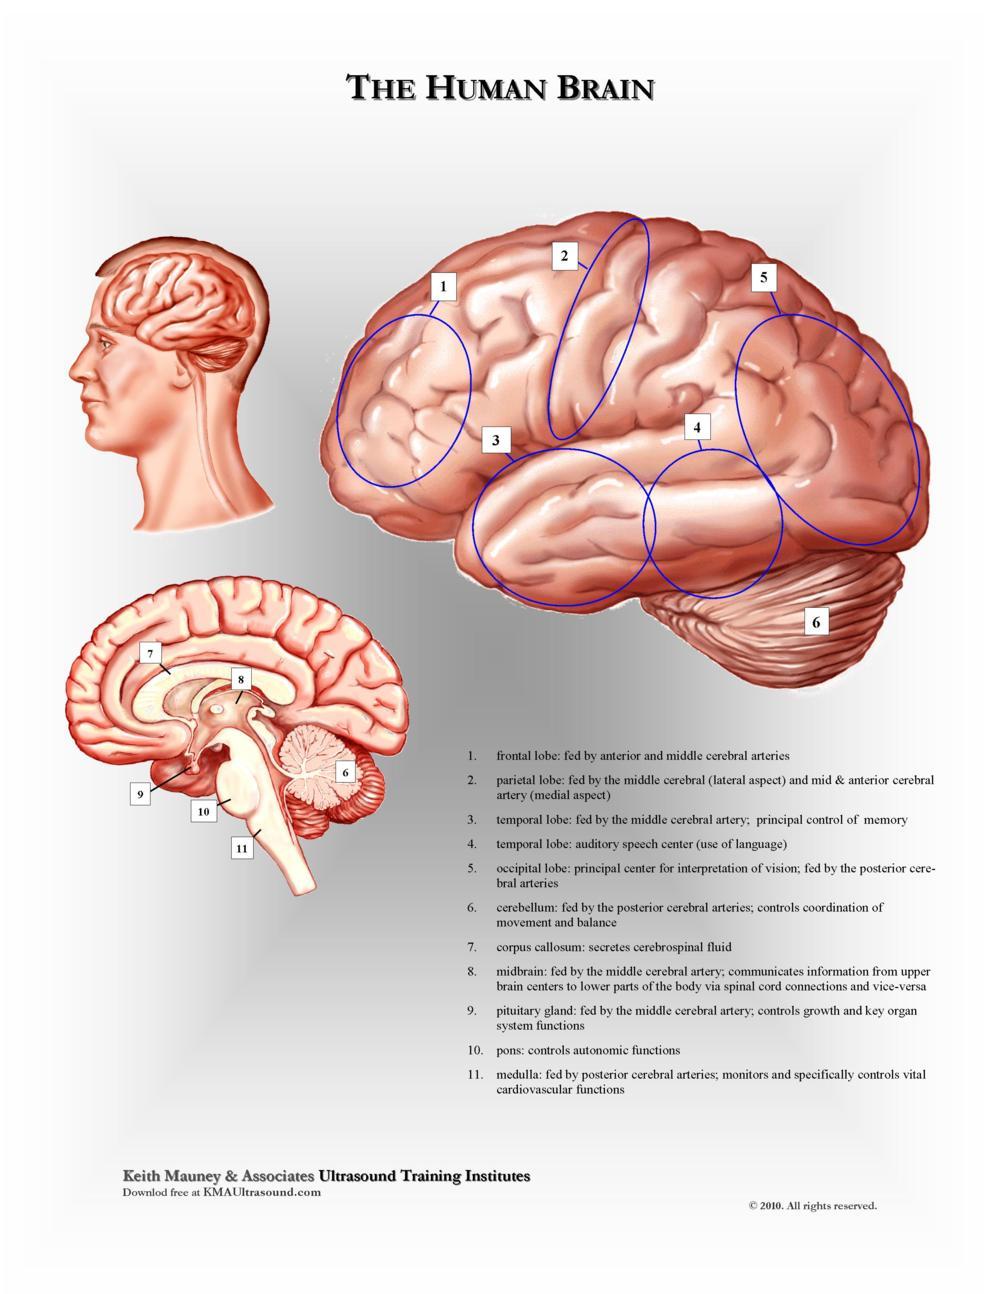 KMA Ultrasound Brain